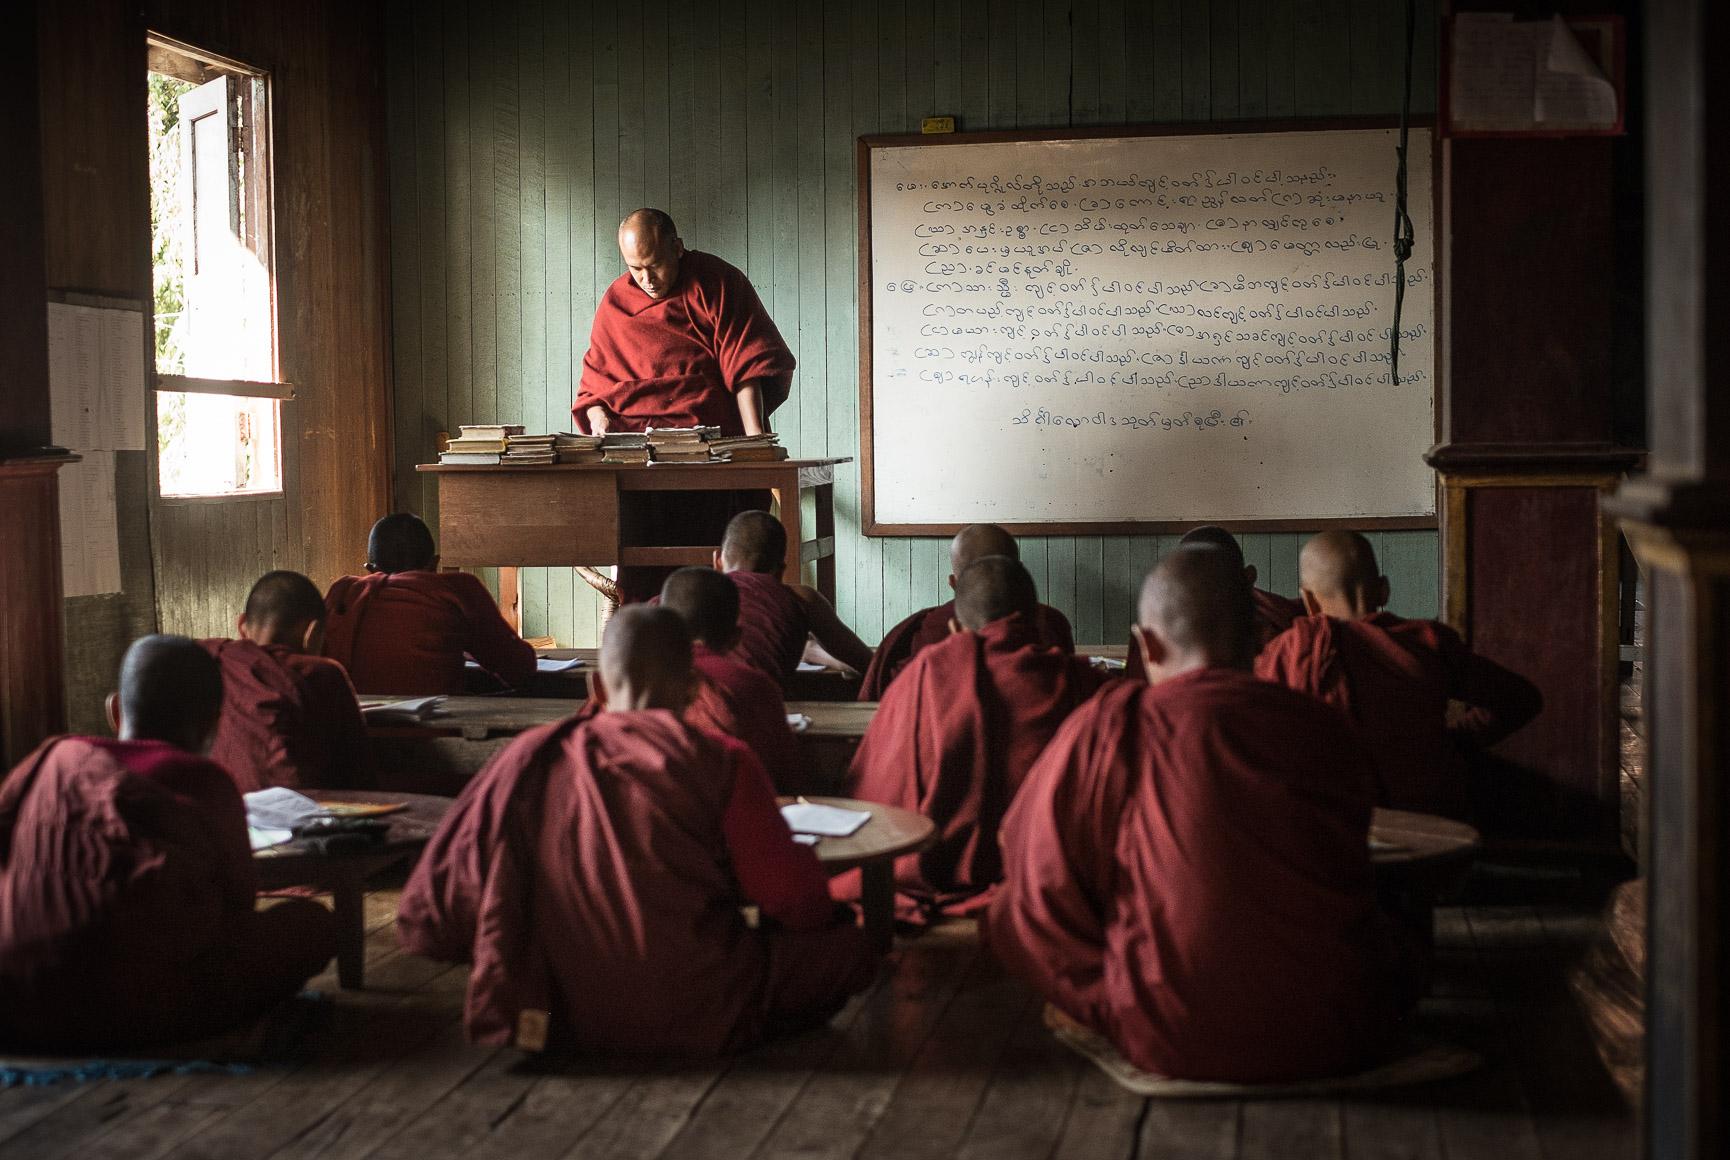 Teacher_Monk.jpg